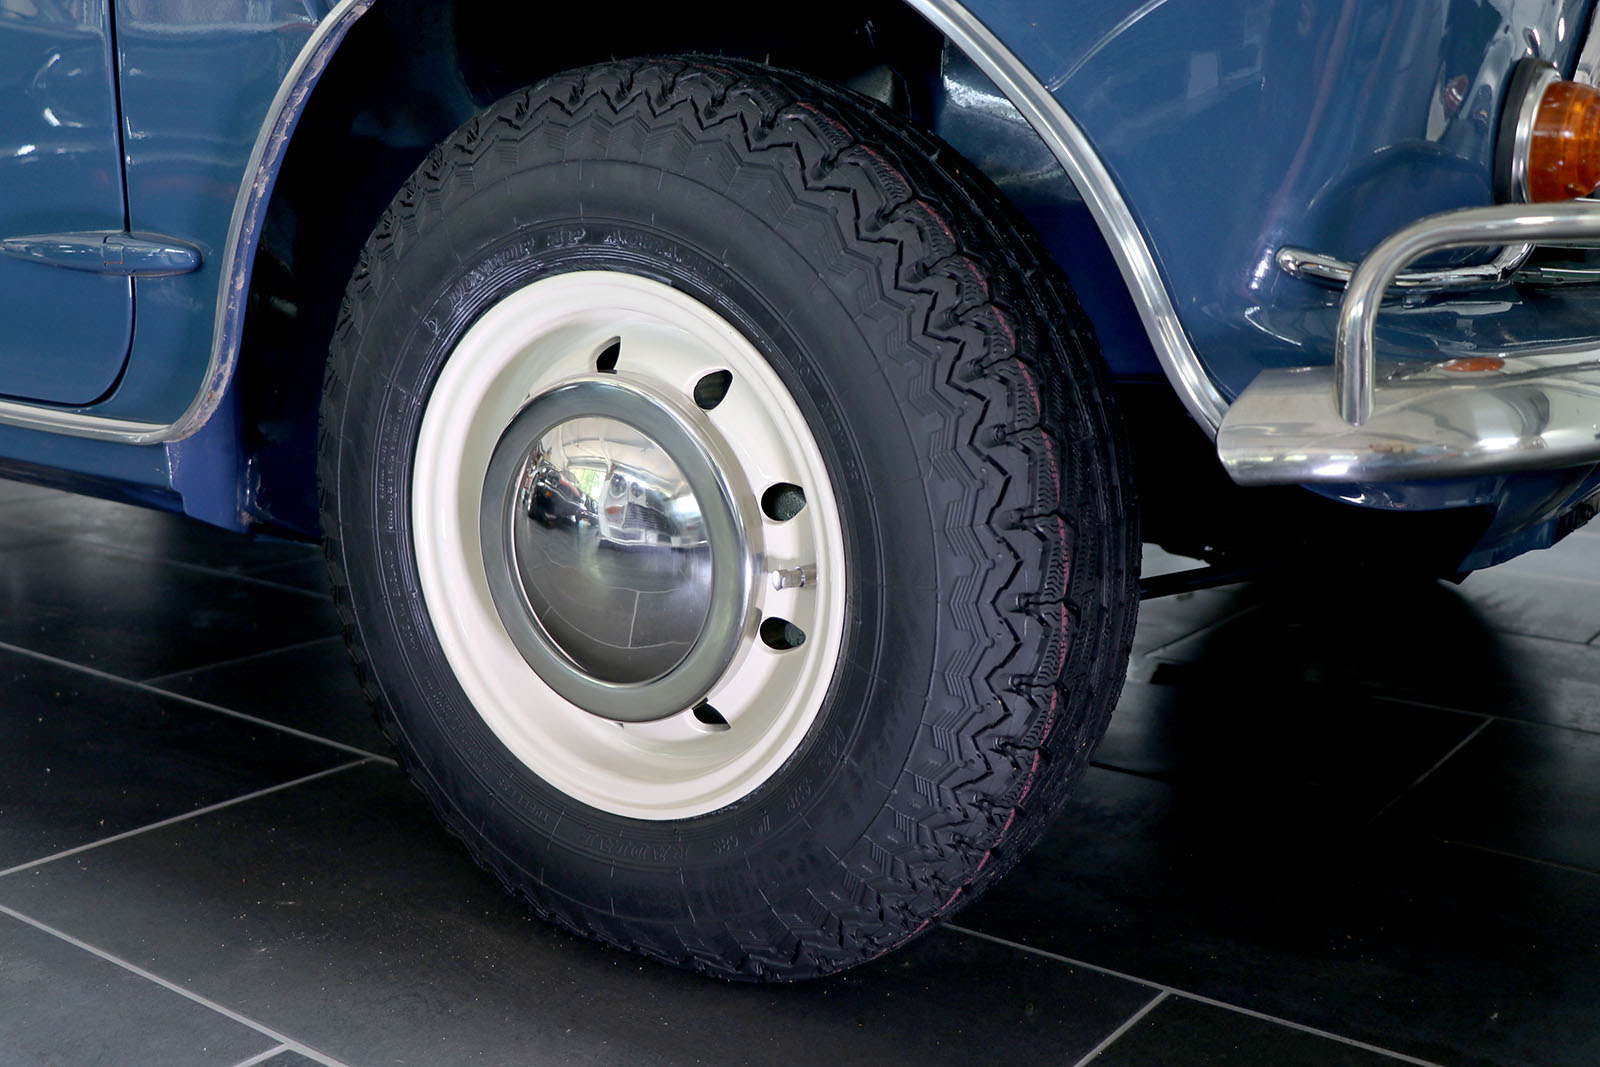 1967 blue Mini Cooper S wheel web.jpg